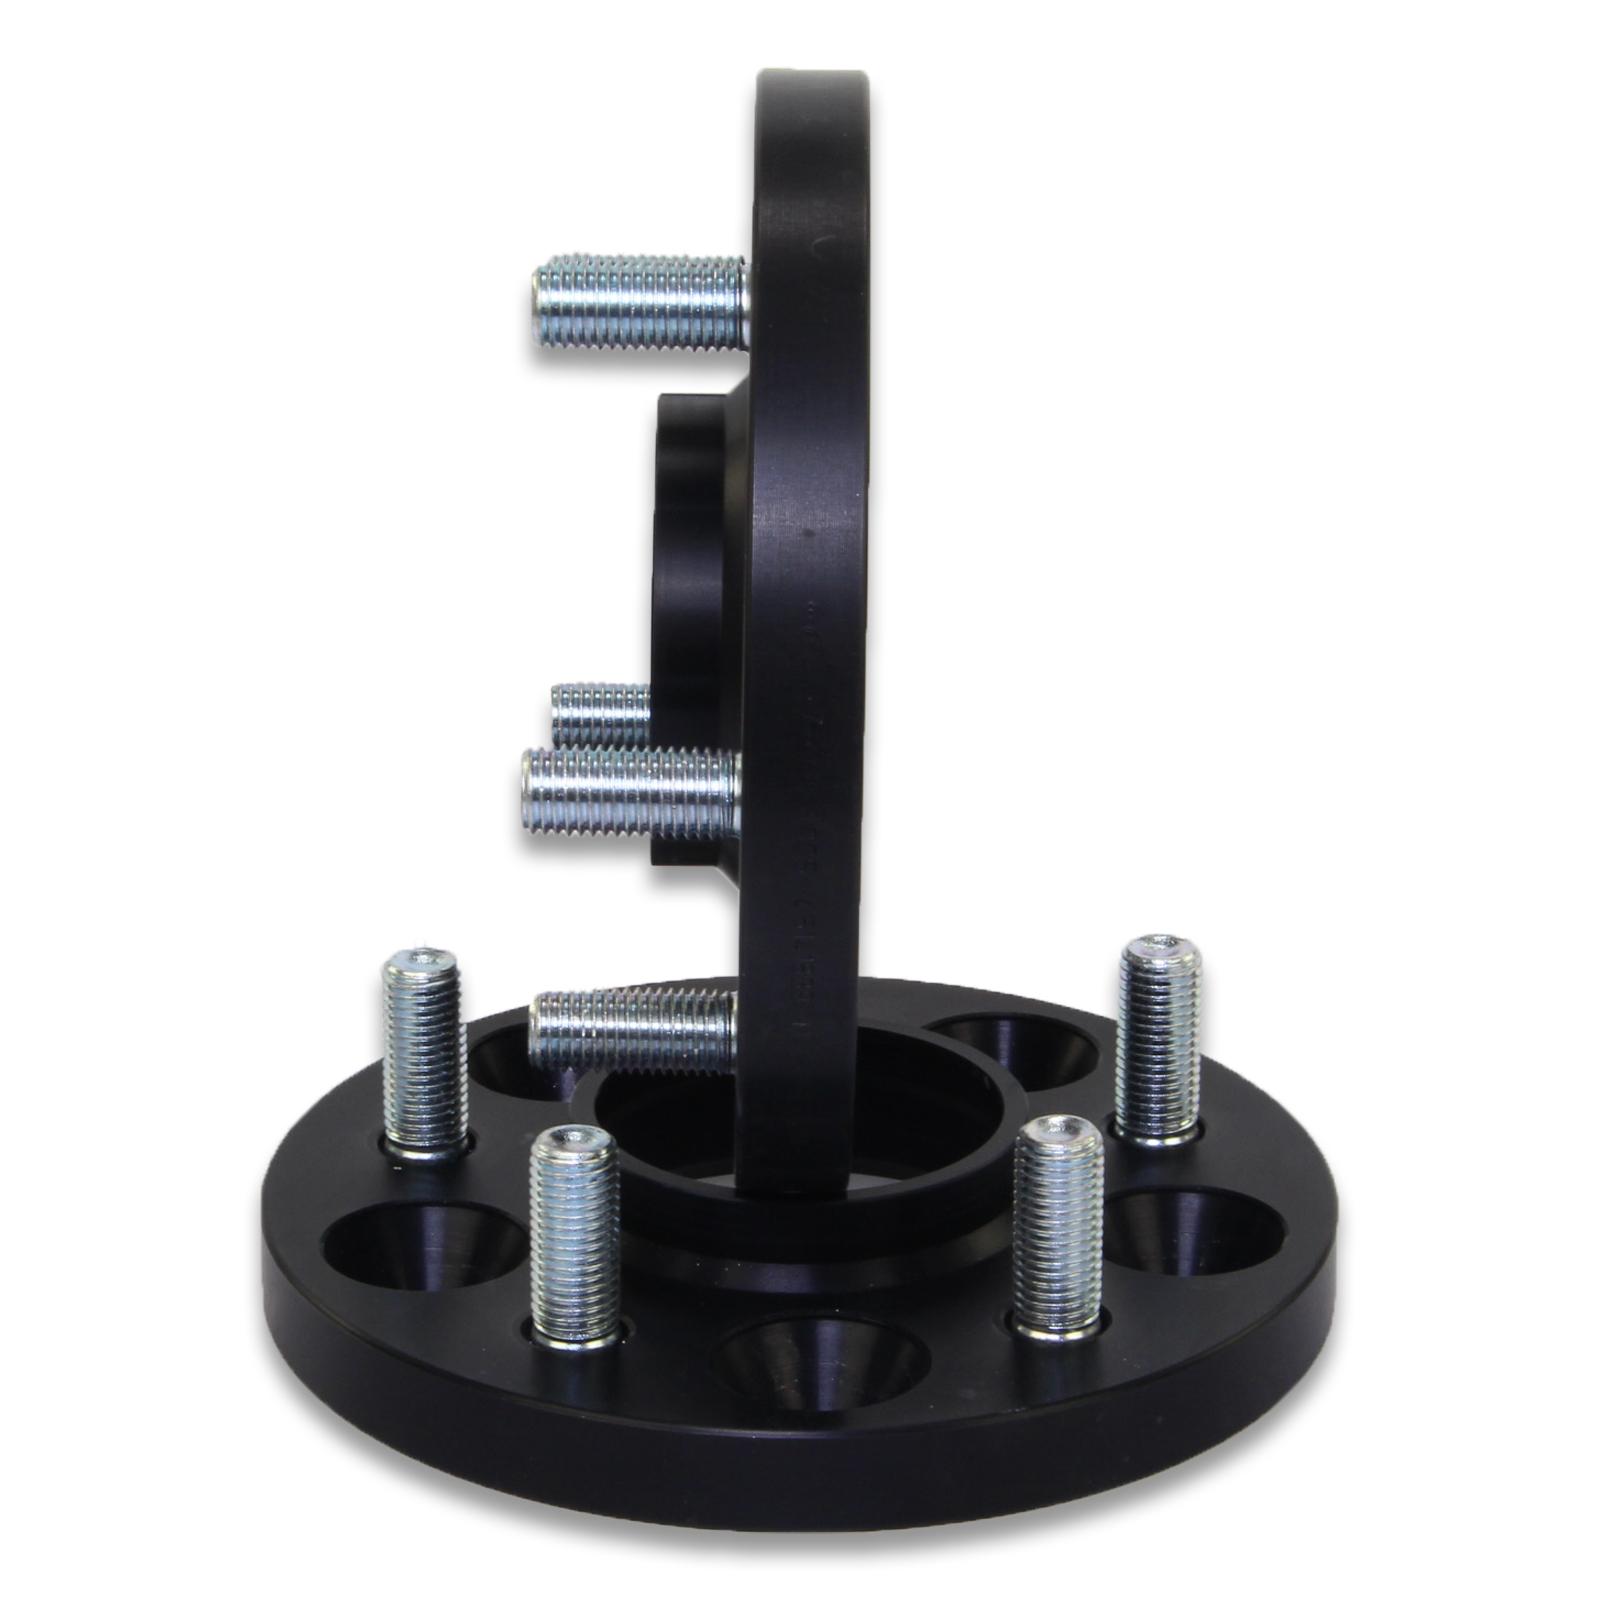 EIBACH Spurplatten Spurverbreiterung Distanzscheibe Ø63,3 5x108 30mm // 2x15mm